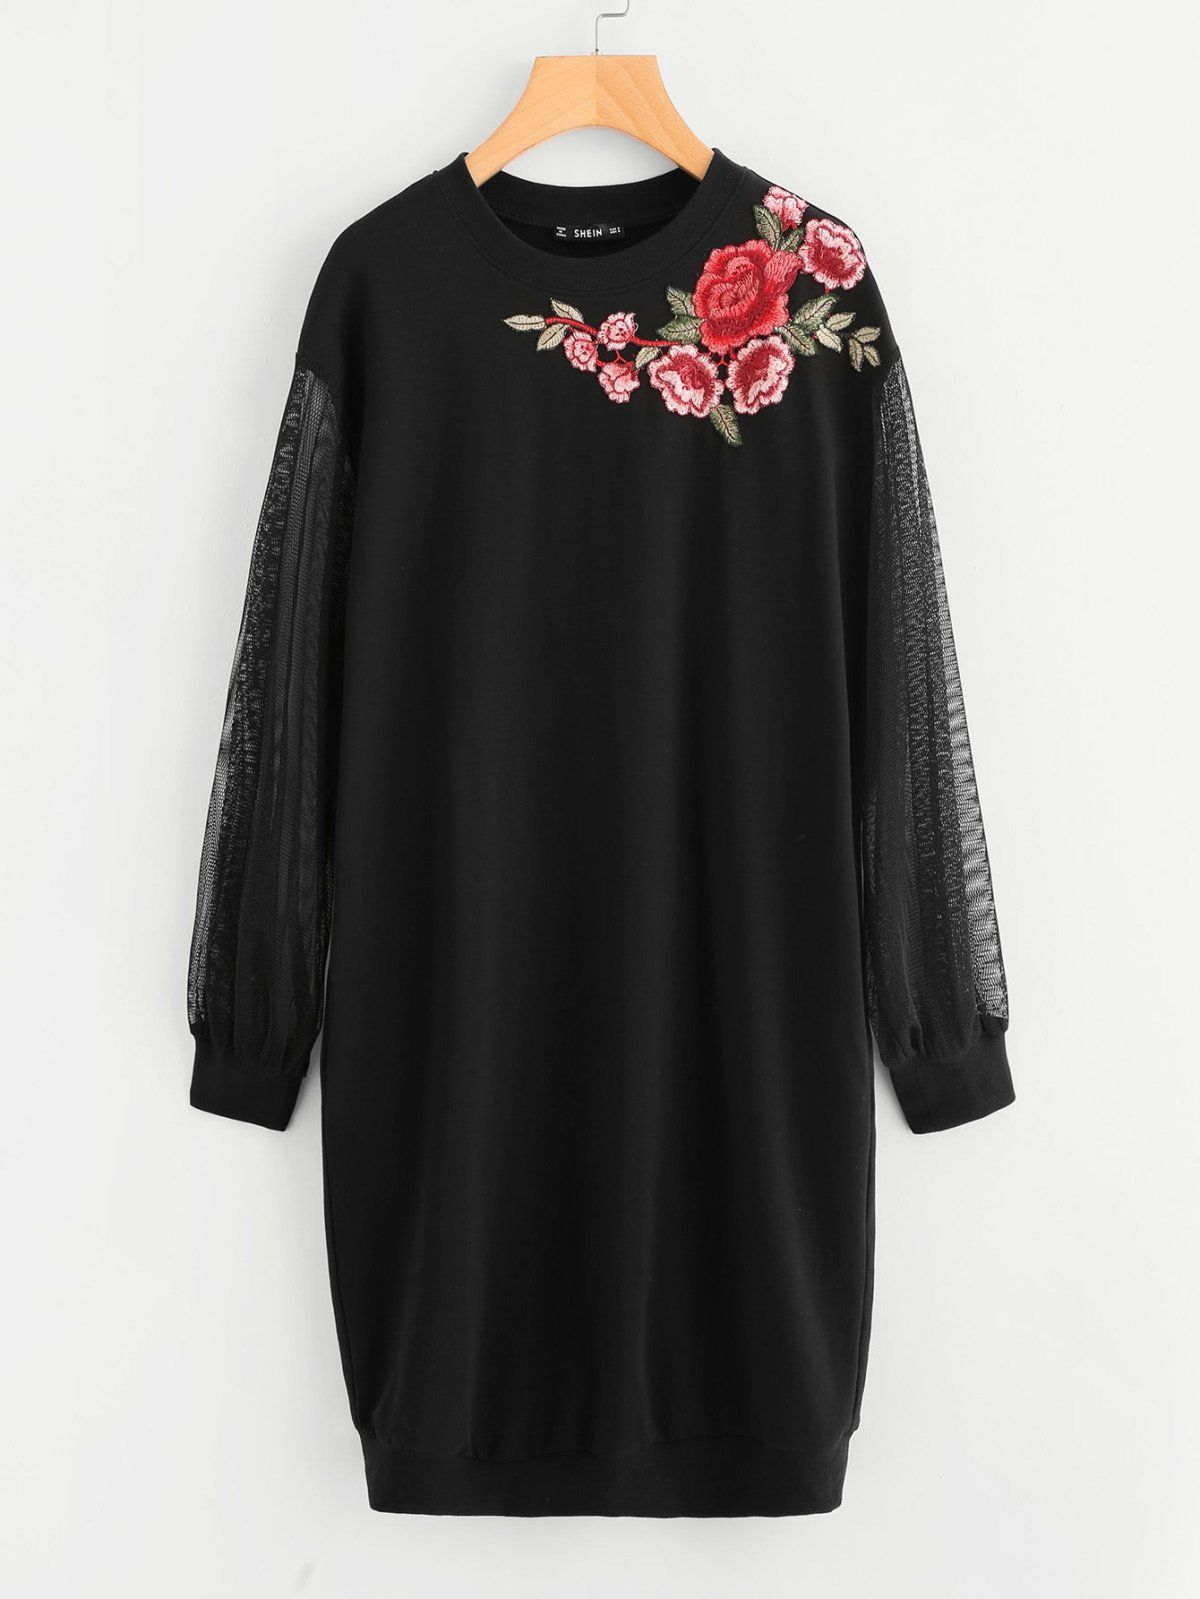 Embroidered flower patch mesh sleeve long sweatshirt sweatshirt